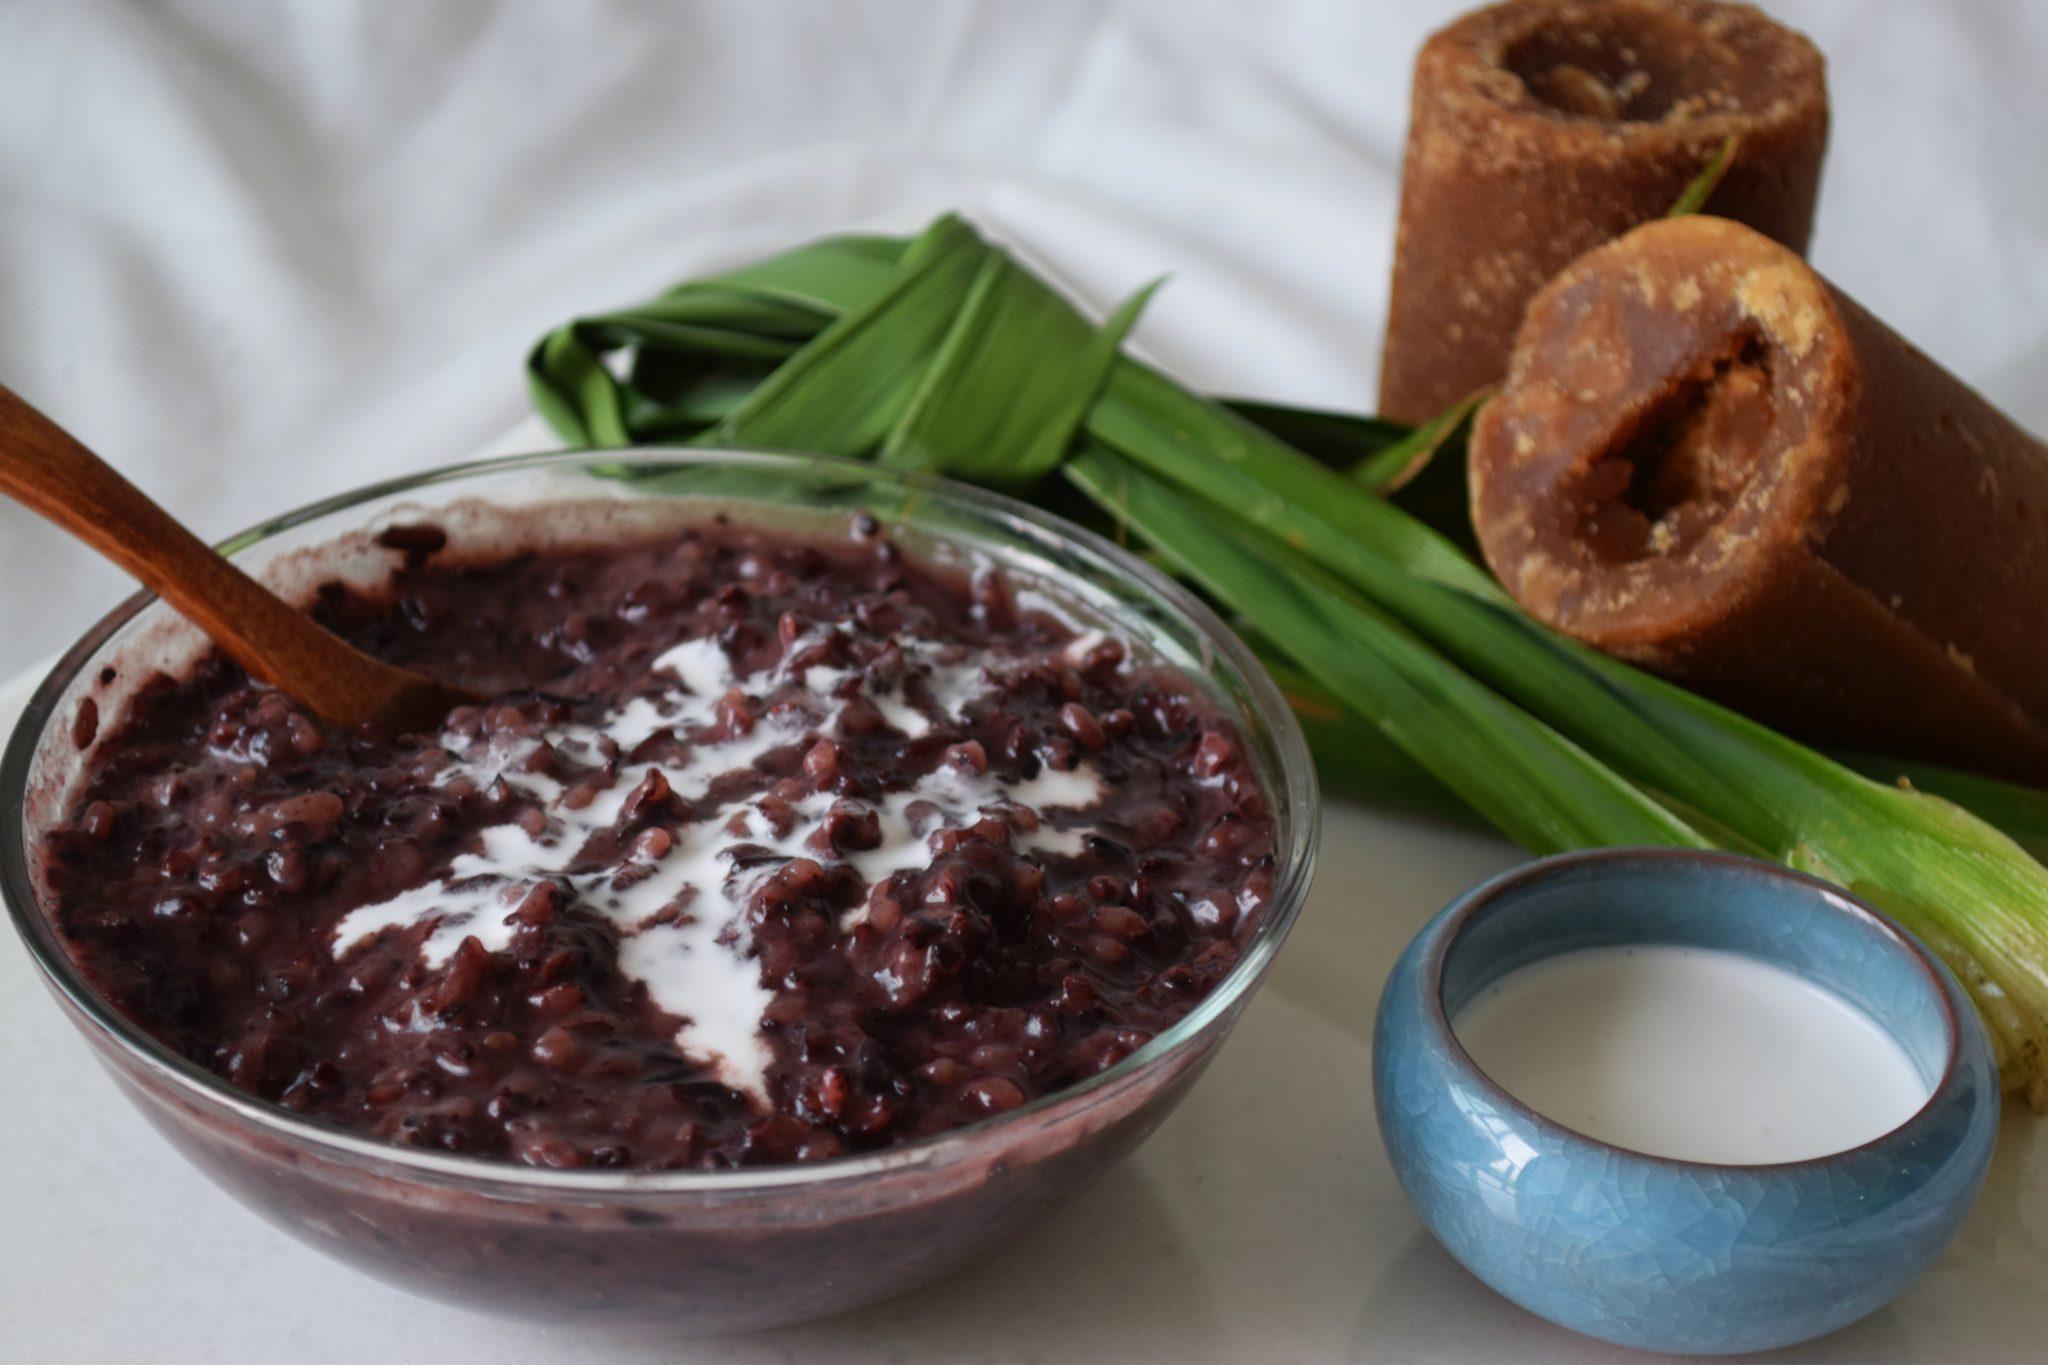 Black Sticky Rice Pudding (Pulut Hitam)